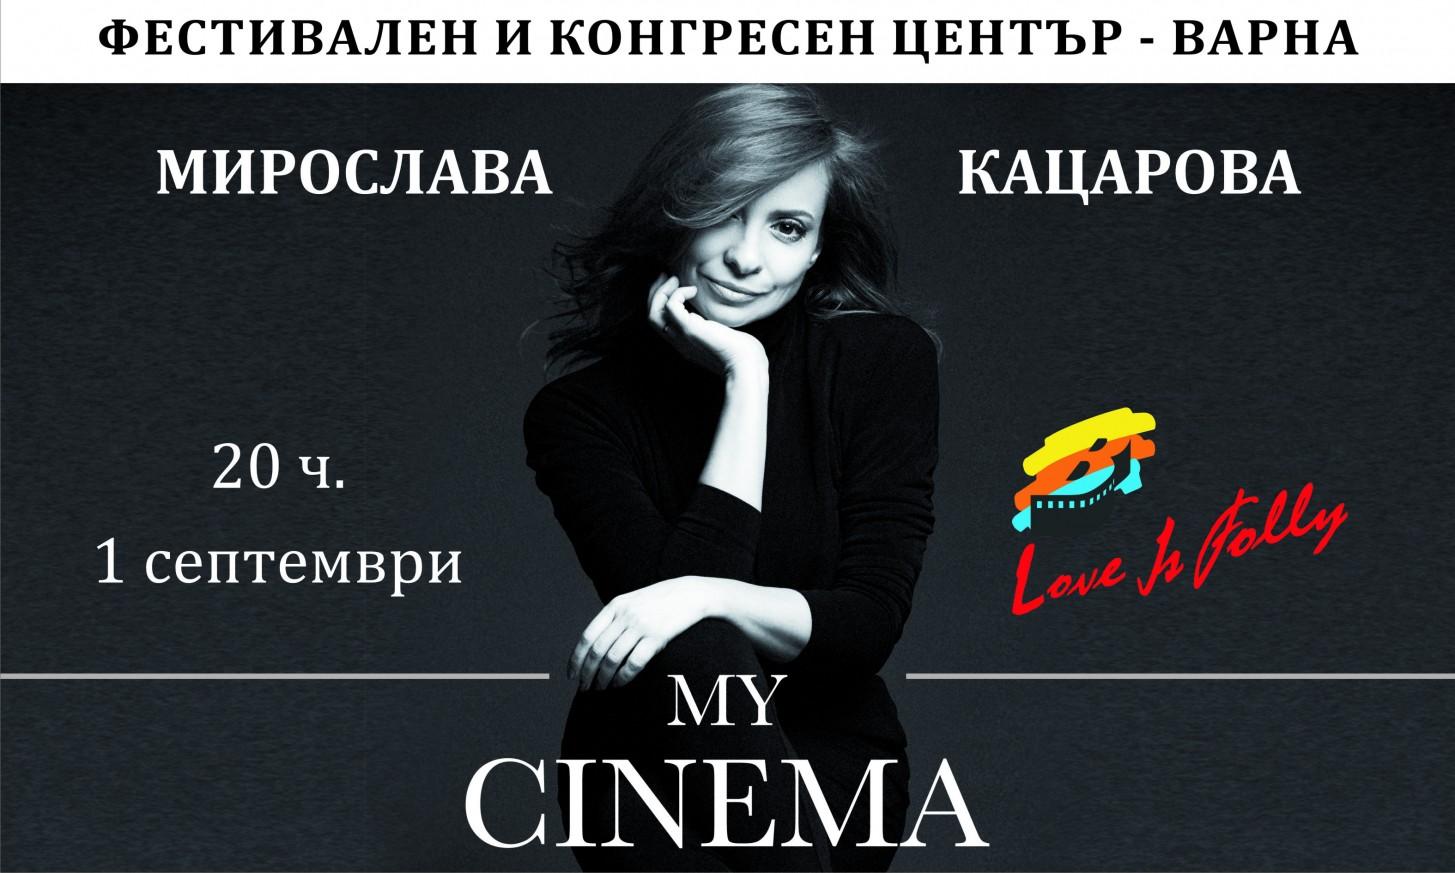 MY CINEMA - концерт на Мирослава Кацарова